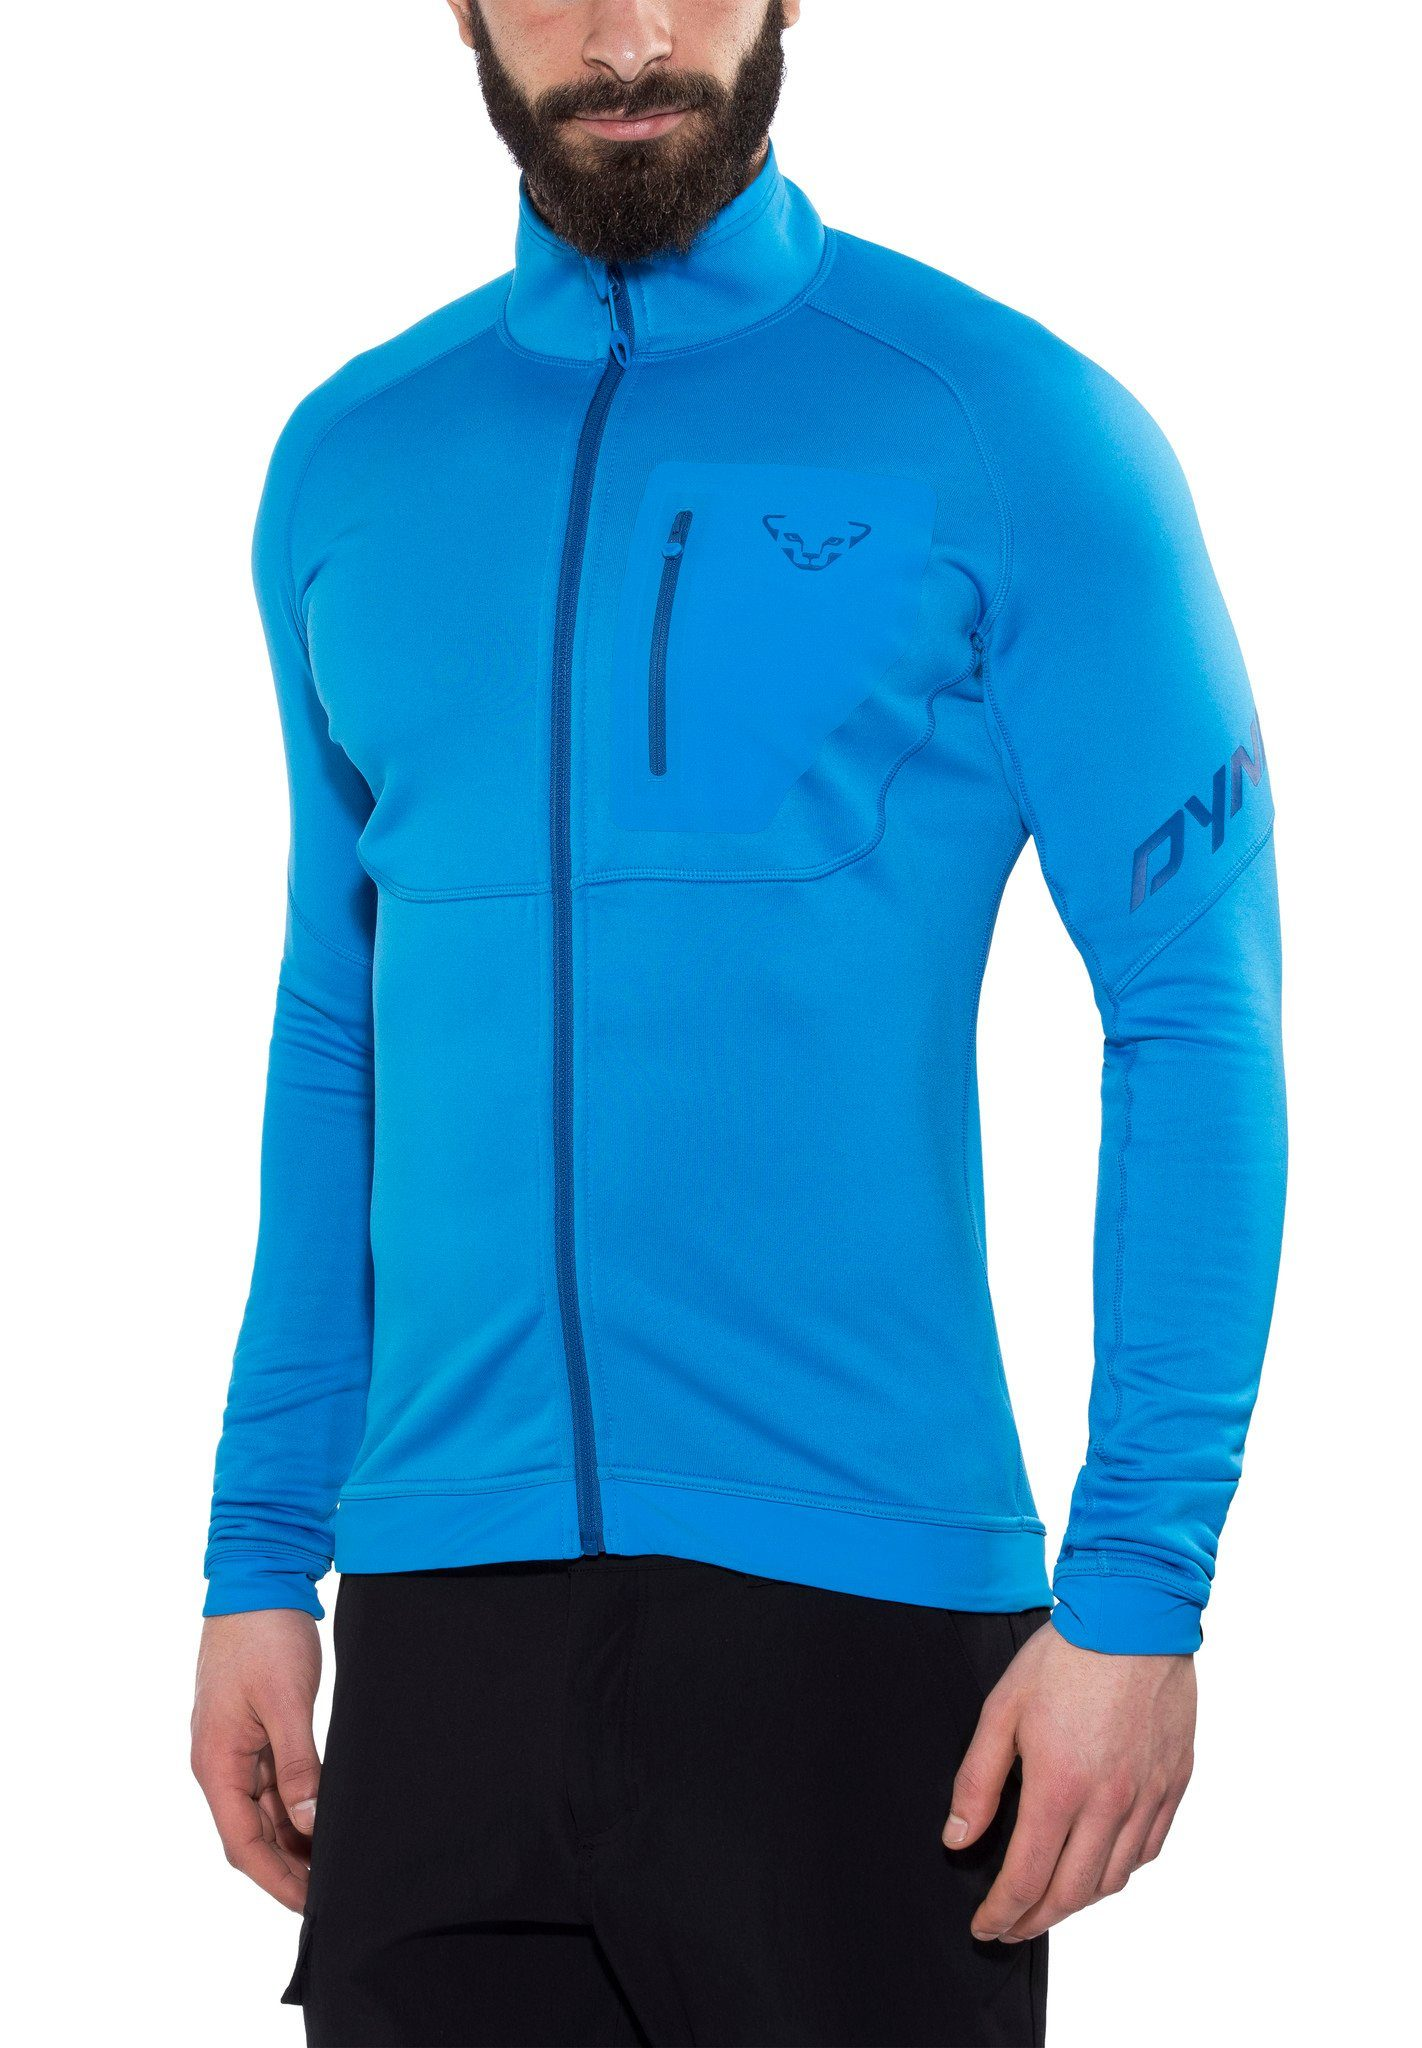 Dynafit Outdoorjacke »Thermal Layer 4 Jacket Men«